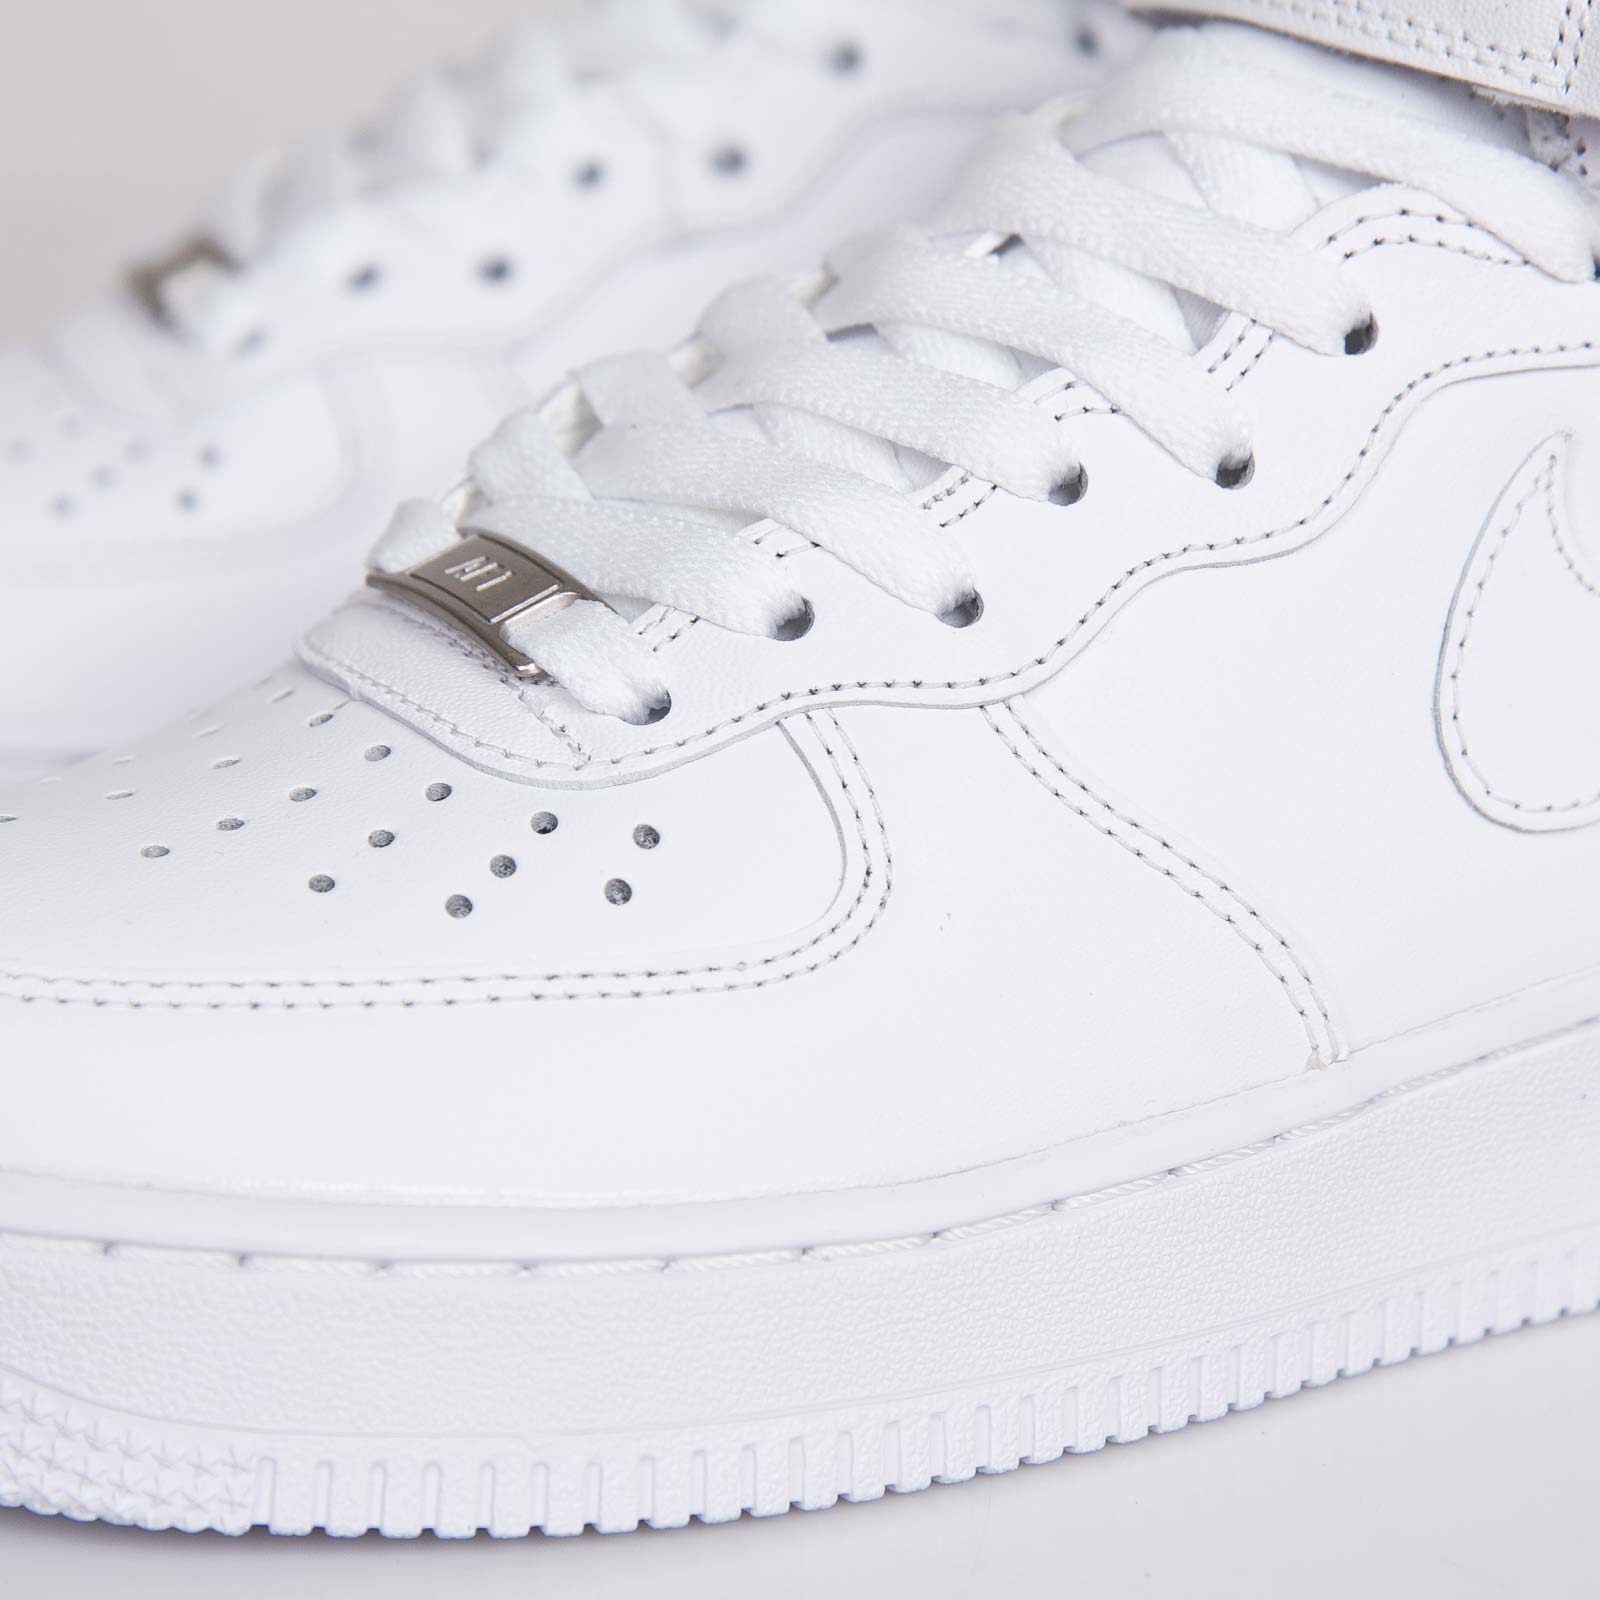 pretty nice ac87c 82851 Nike Wmns Air Force 1 Mid 07 LE - 366731-100 - Sneakersnstuff   sneakers    streetwear online since 1999